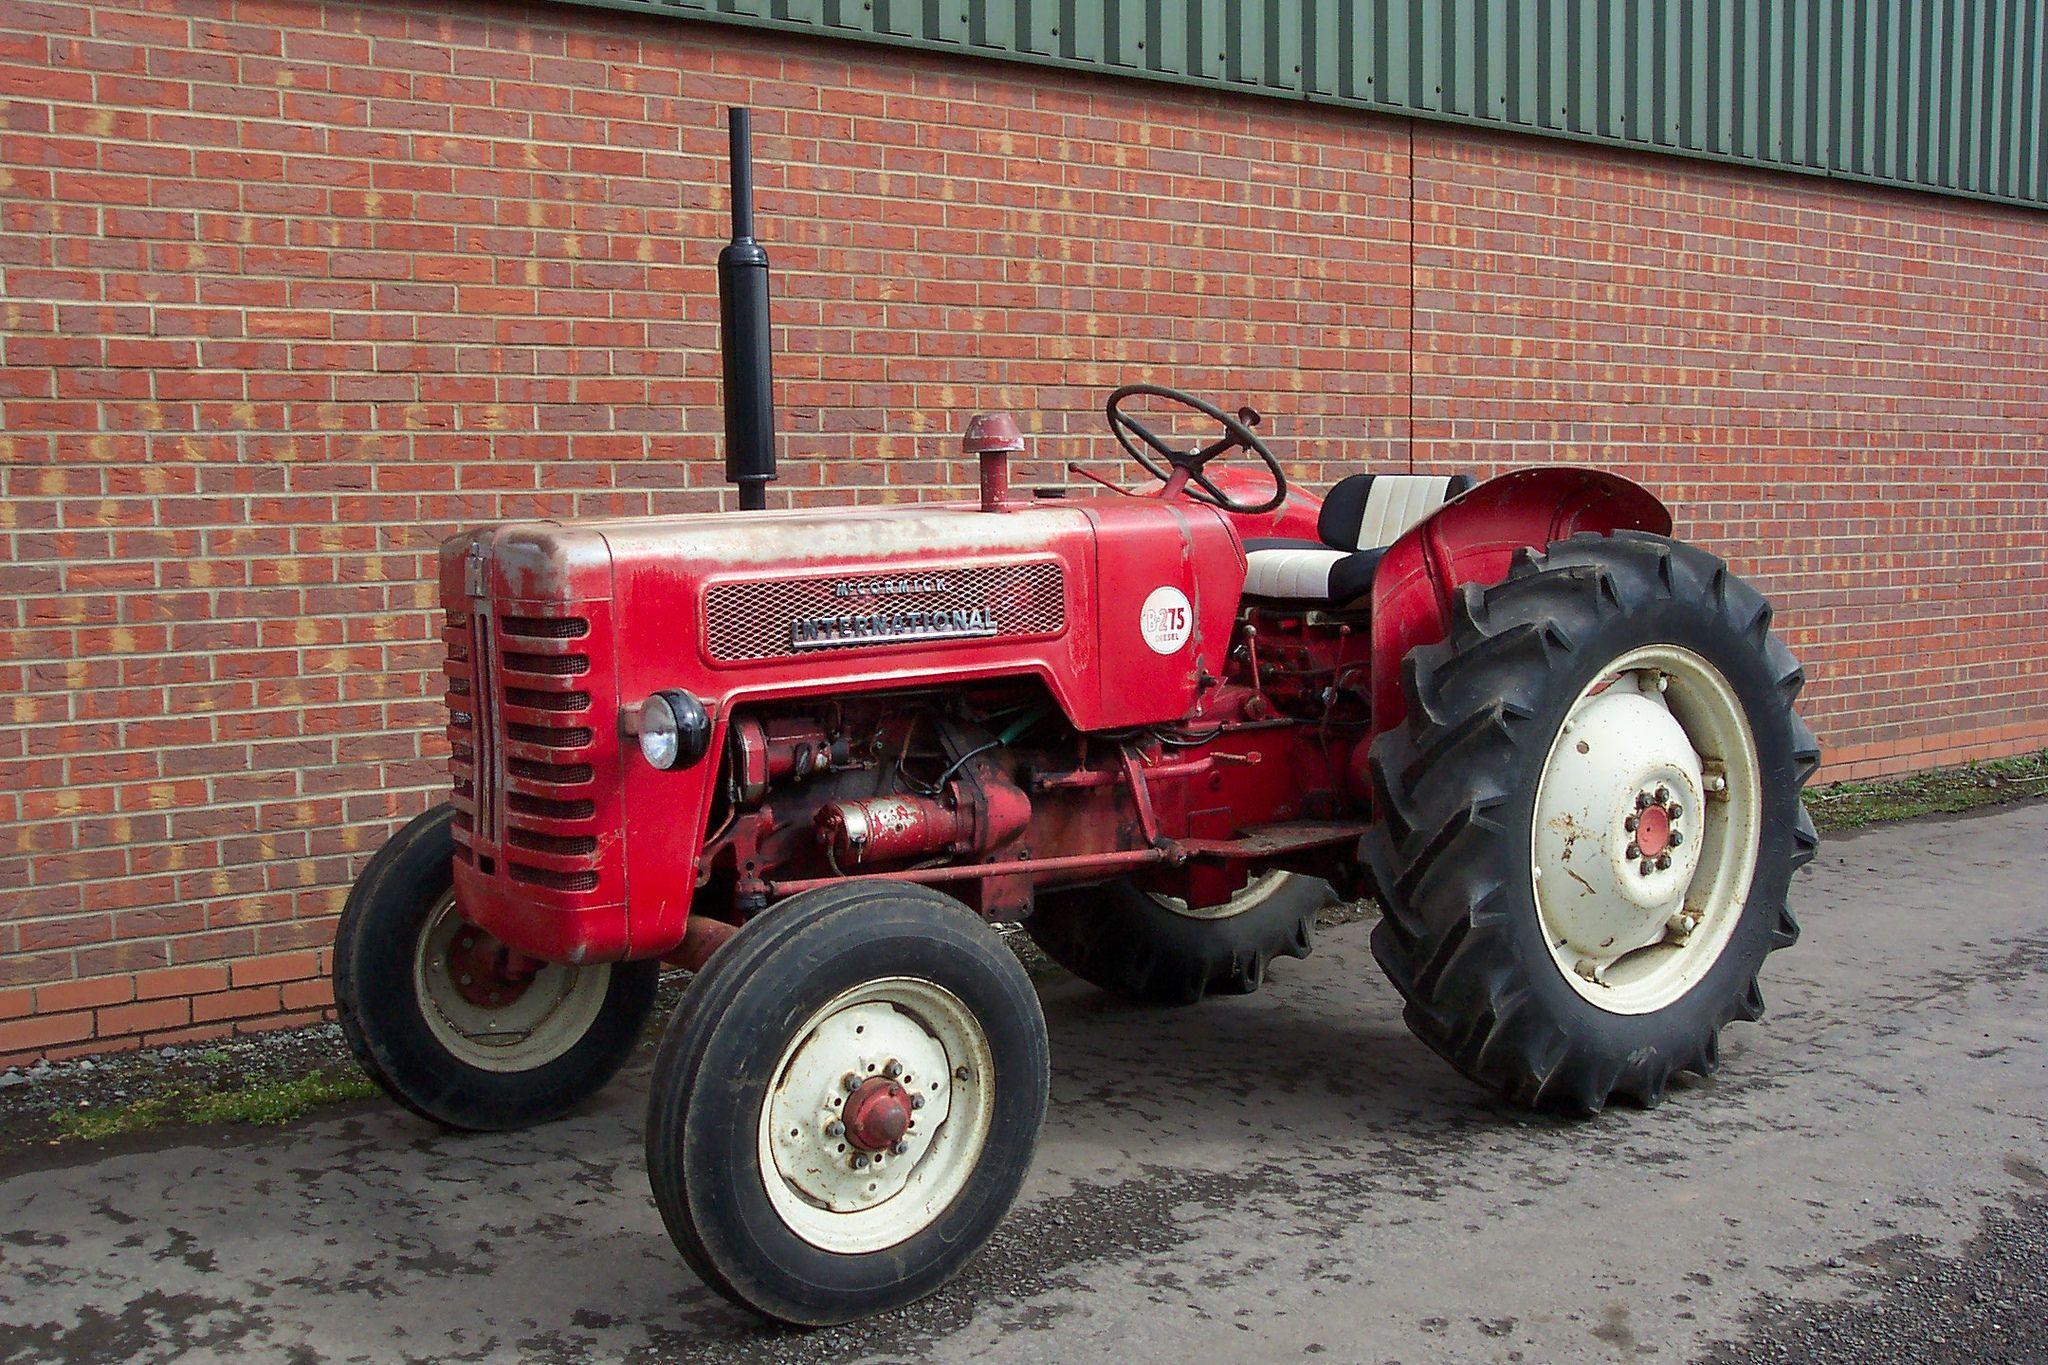 Mccormick International B275 Tractors International Harvester Tractors International Tractors